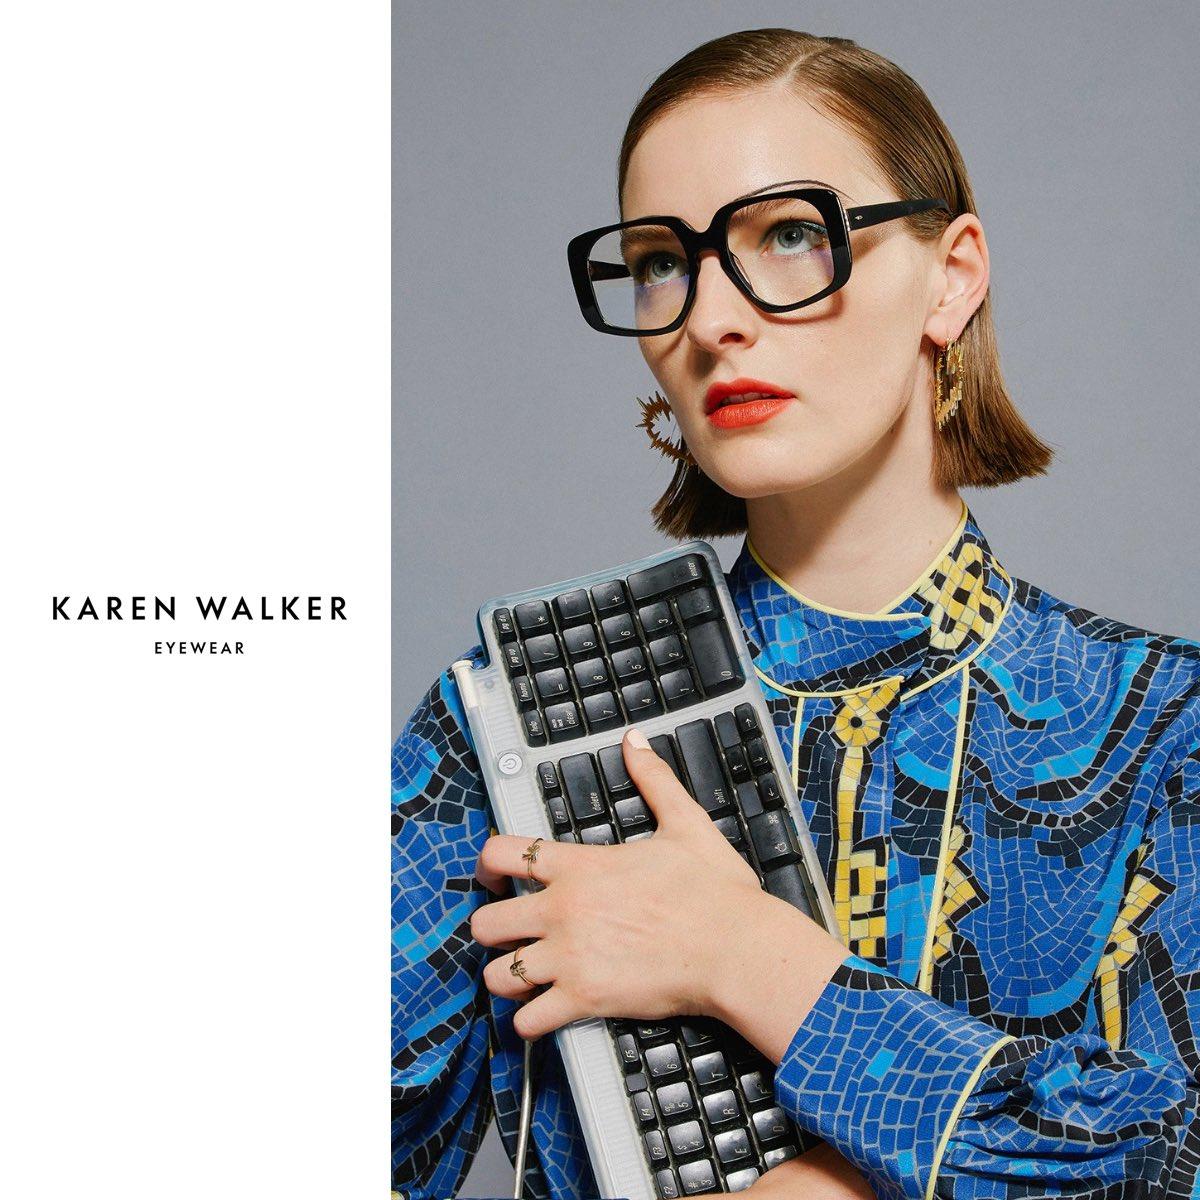 "#Workfromhome be like • #KarenWalker -""Amna"" Blue Light filtering lenses  Eyewear Distributed by @quad22_thailand  #sunglassses #eyewear #meneyewear #quad22 #quad22thailand #womeneyewear #KarenWalkerEyewear #WFH #โควิค19"